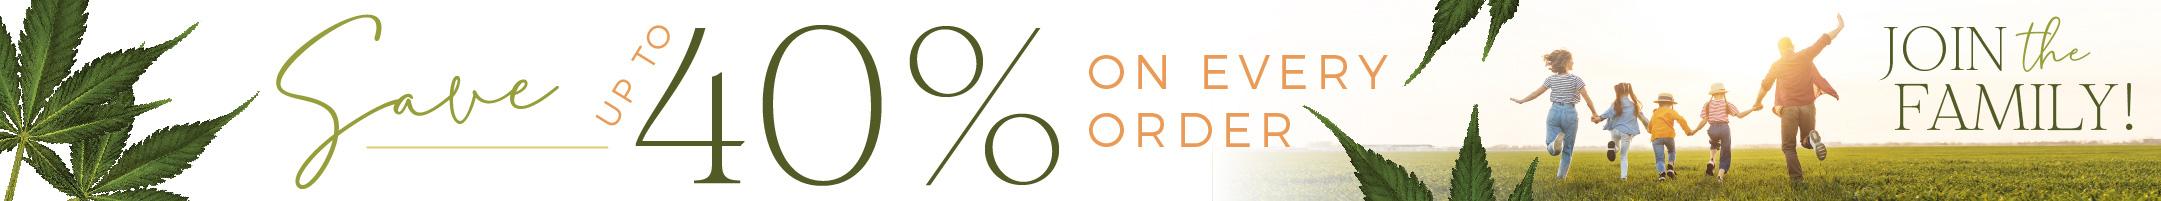 Verde-Membership-Launch-Promo-Graphics_verde-site-banner